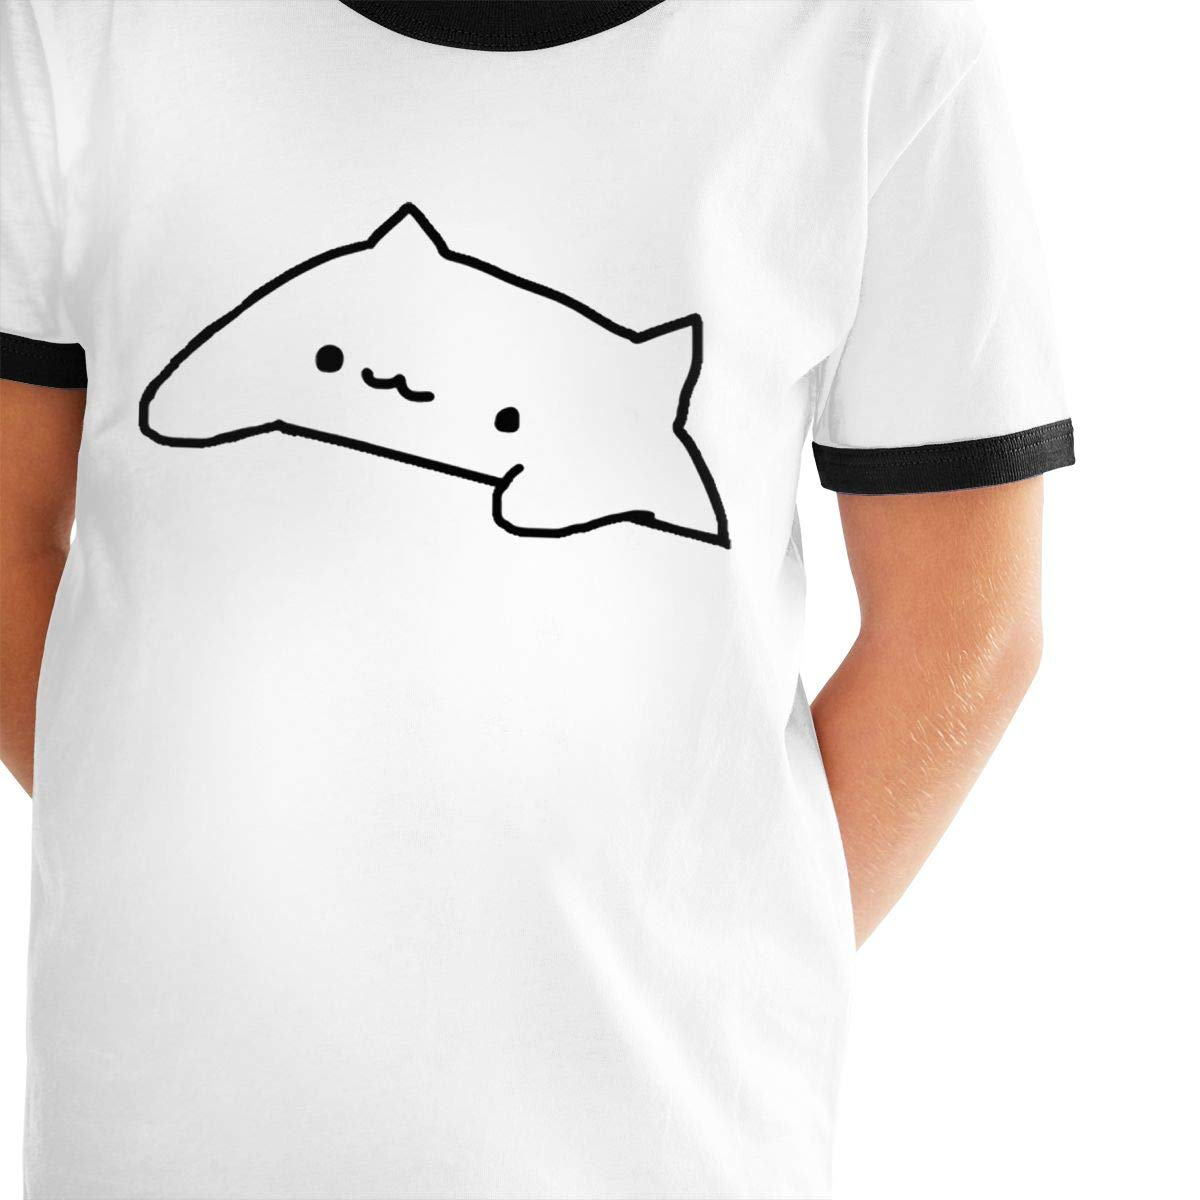 Cute Bongo Cat Unisex Childrens Short Sleeve T-Shirt Kids Or Little Boys and Girls